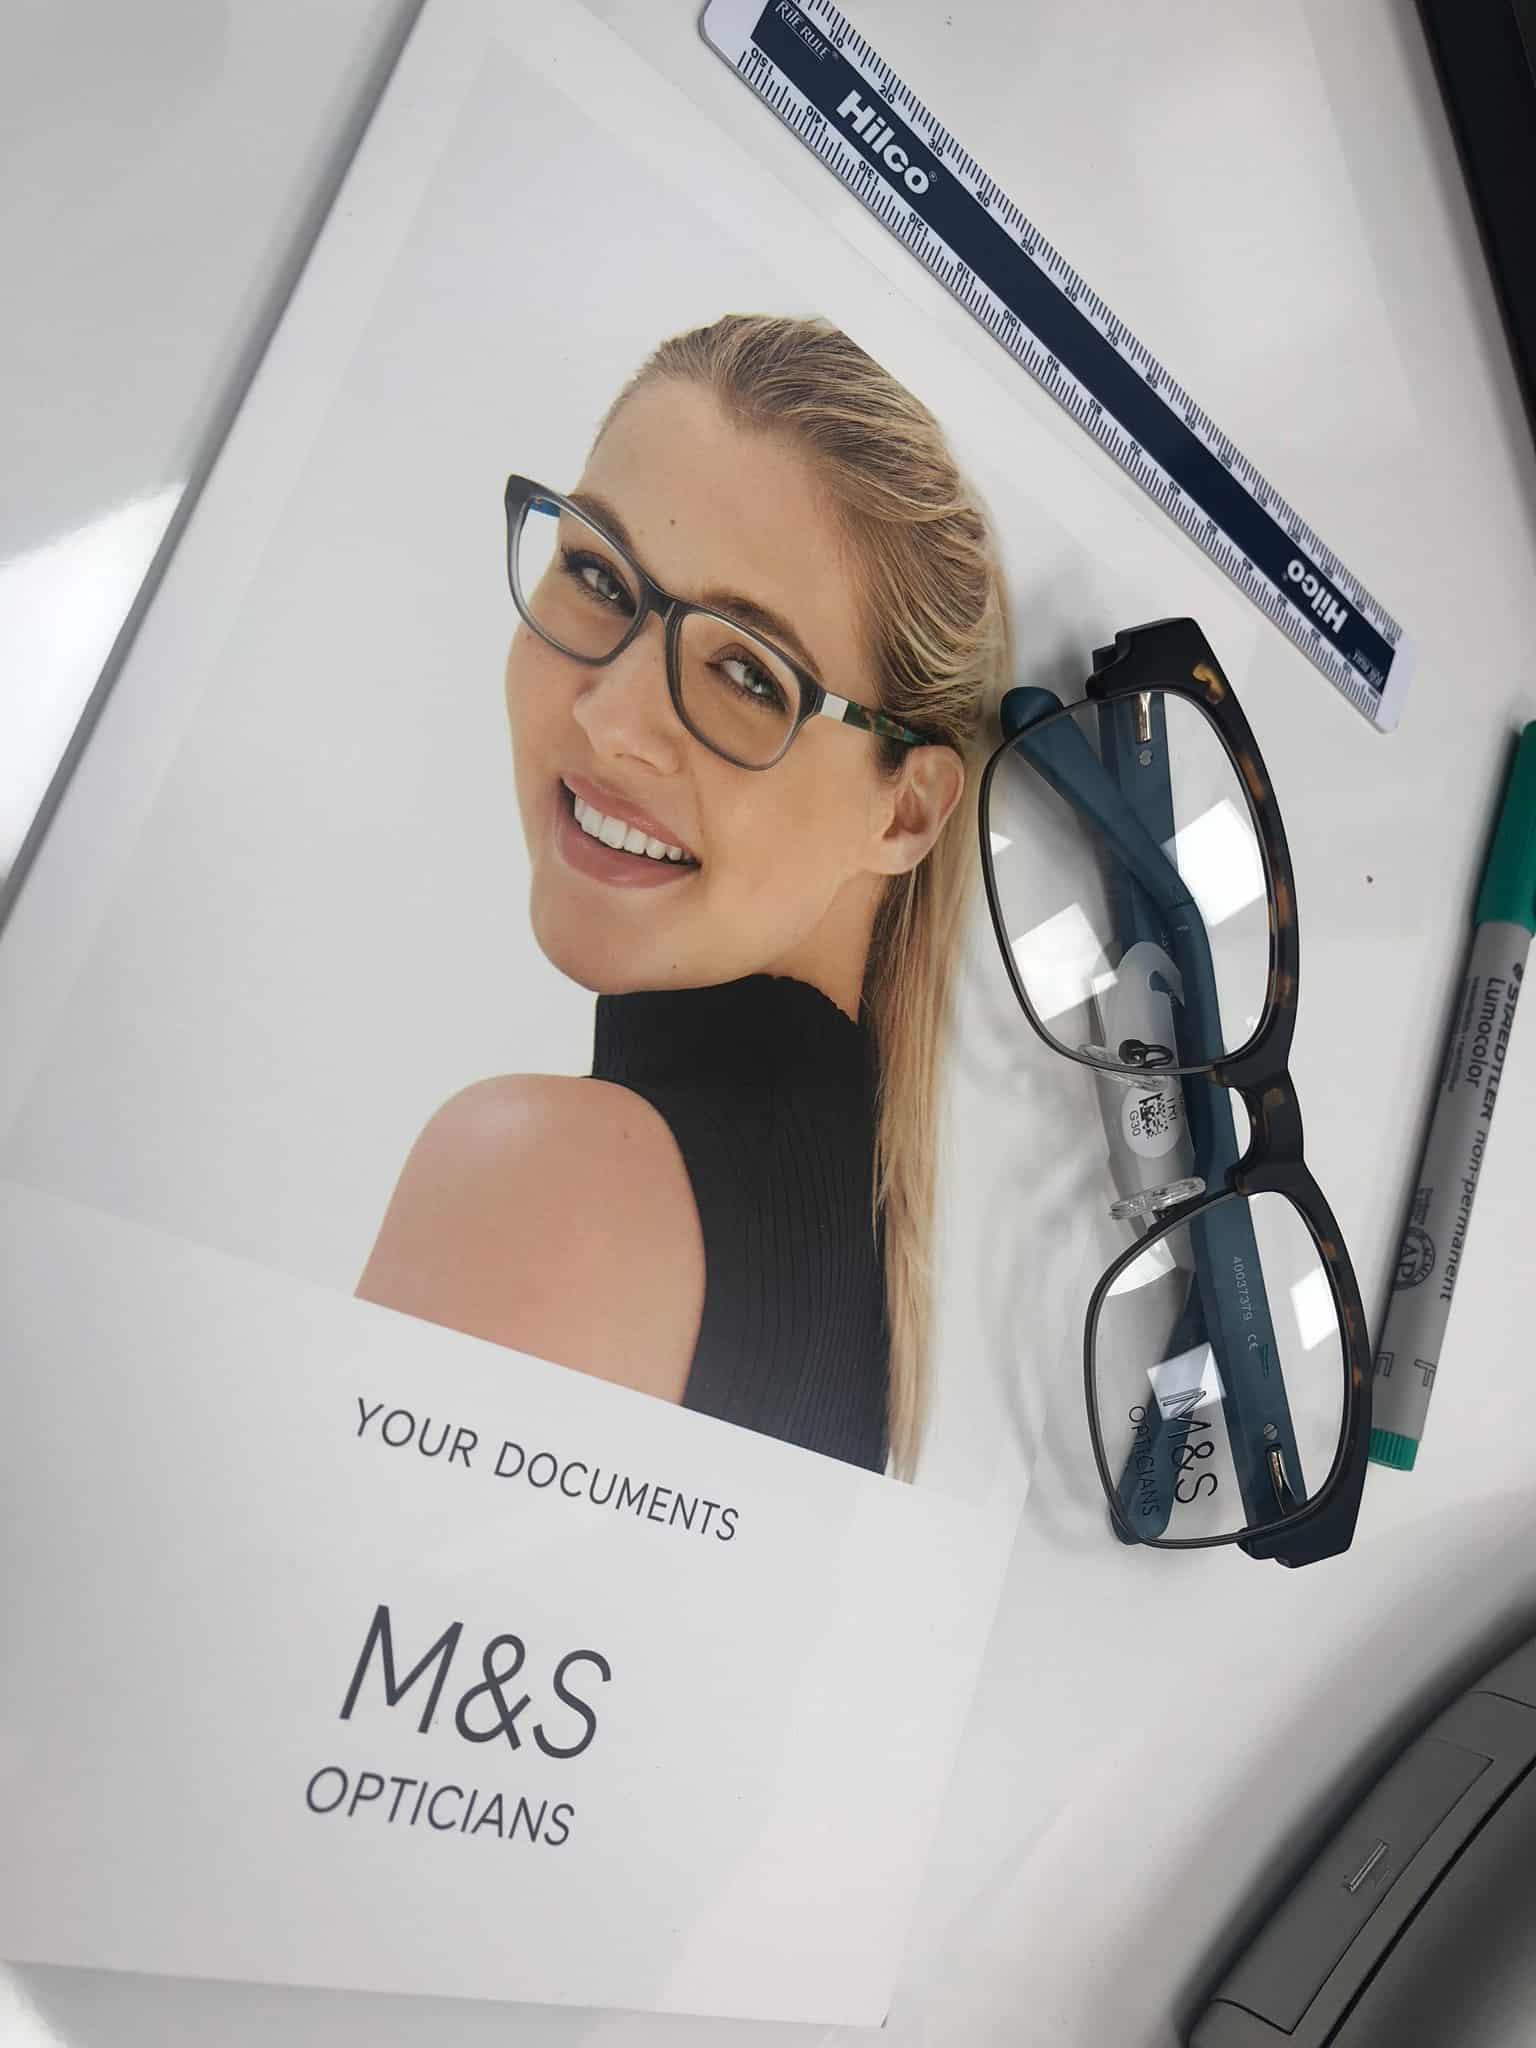 M&S Opticians for eye test and designer glasses